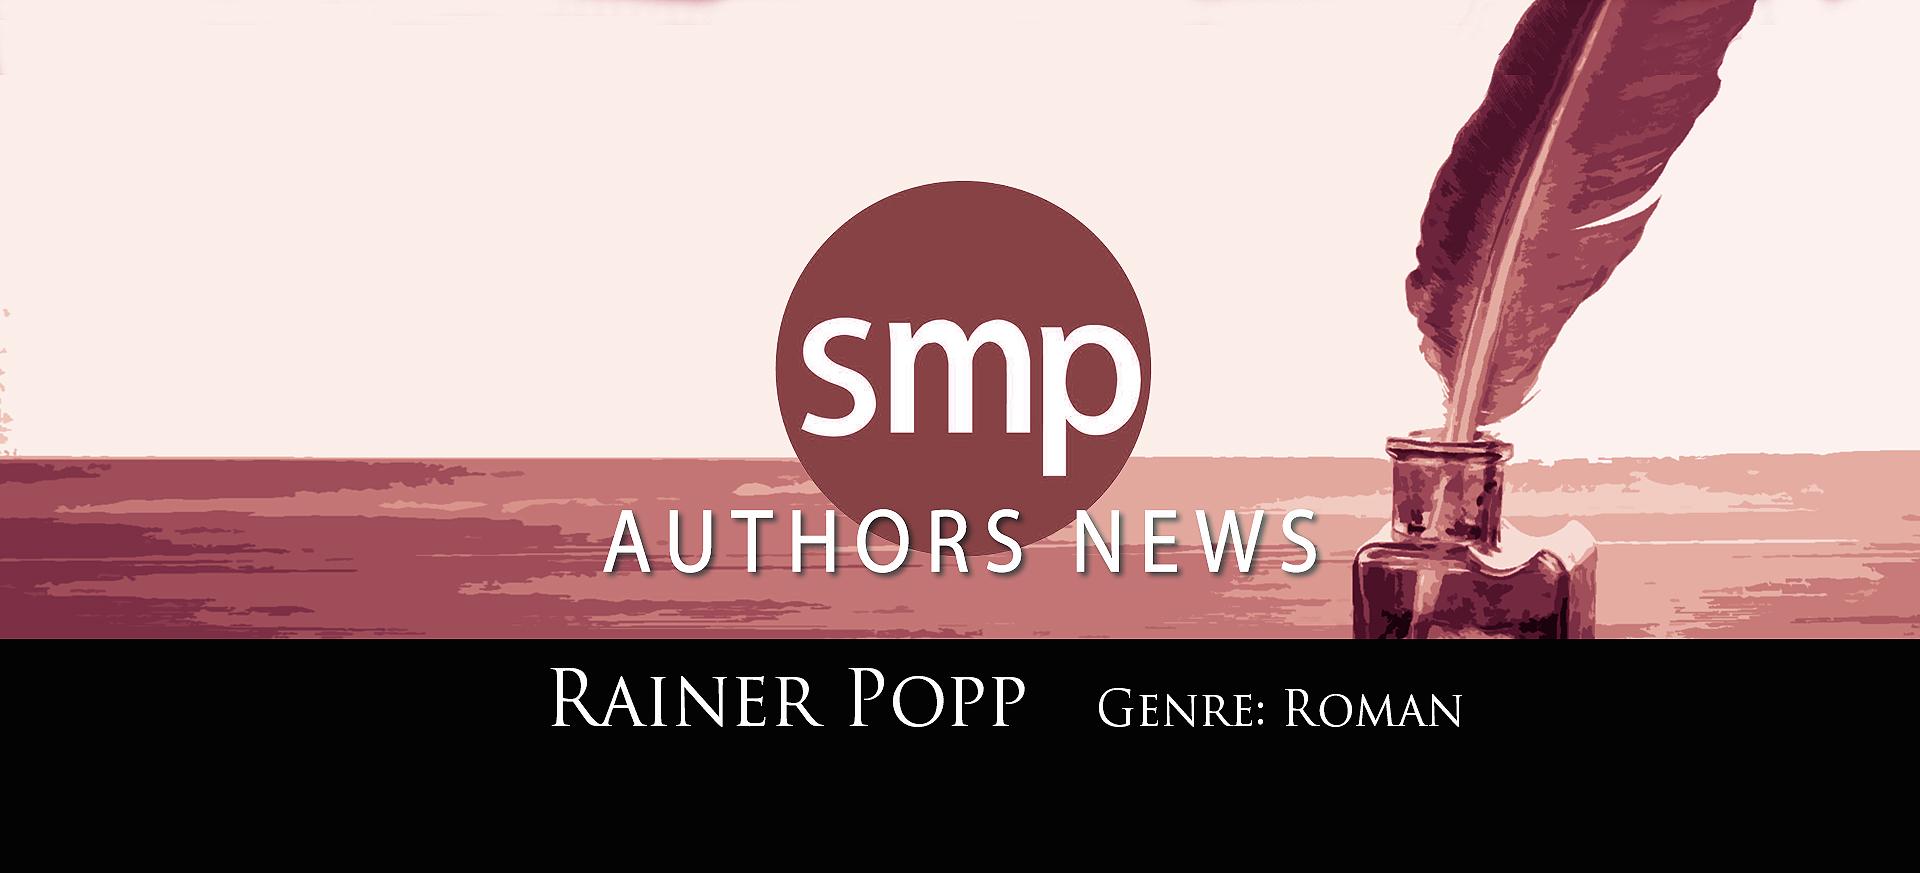 Autoren-Porträt: Rainer Popp